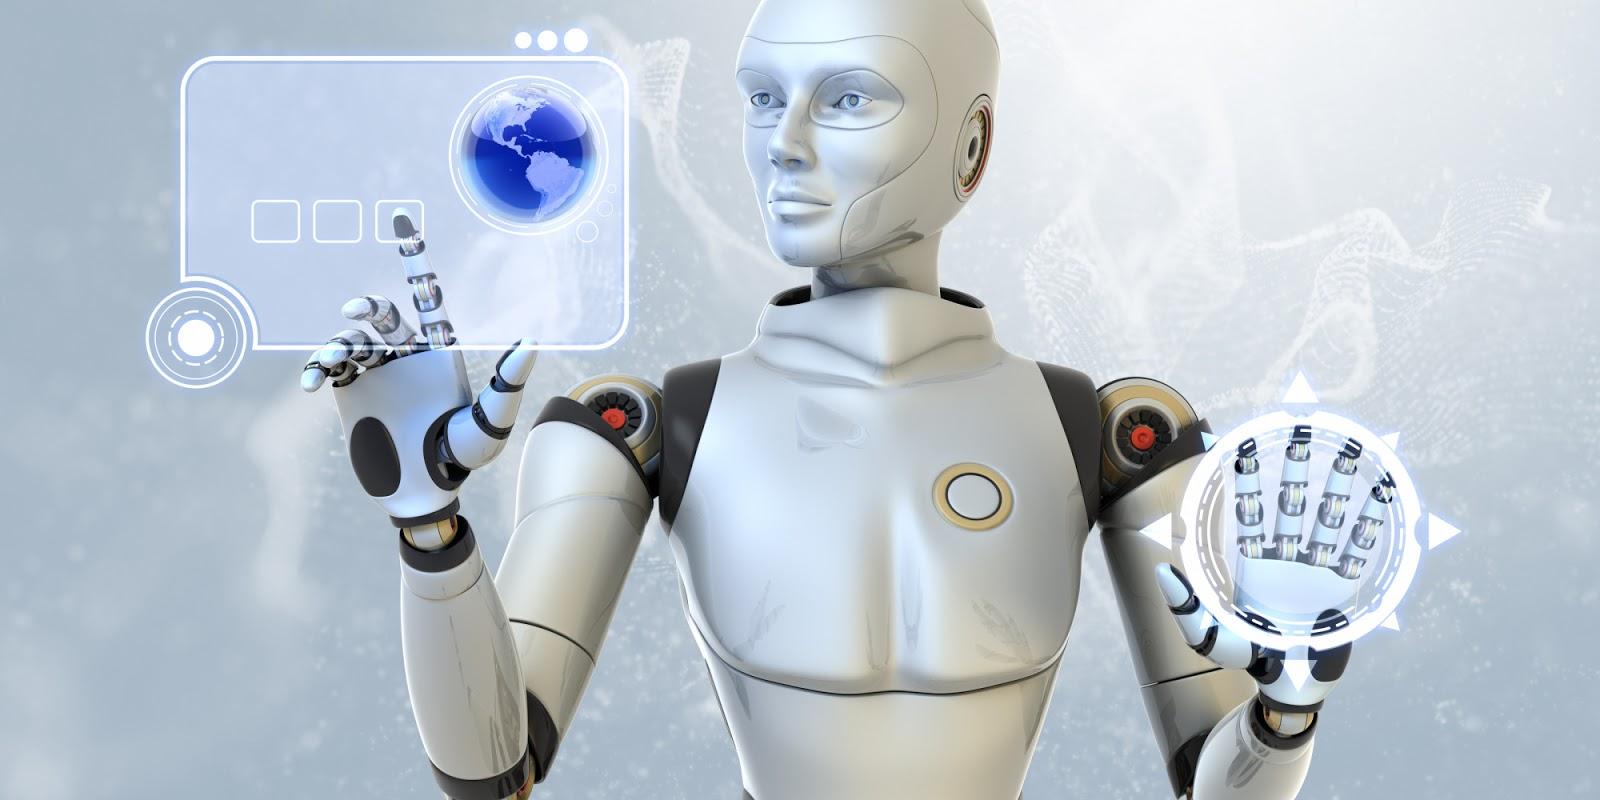 Tugas 4 Contoh Penggunaan AI Dalam Kehidupan Sehari-hari Dosen ...